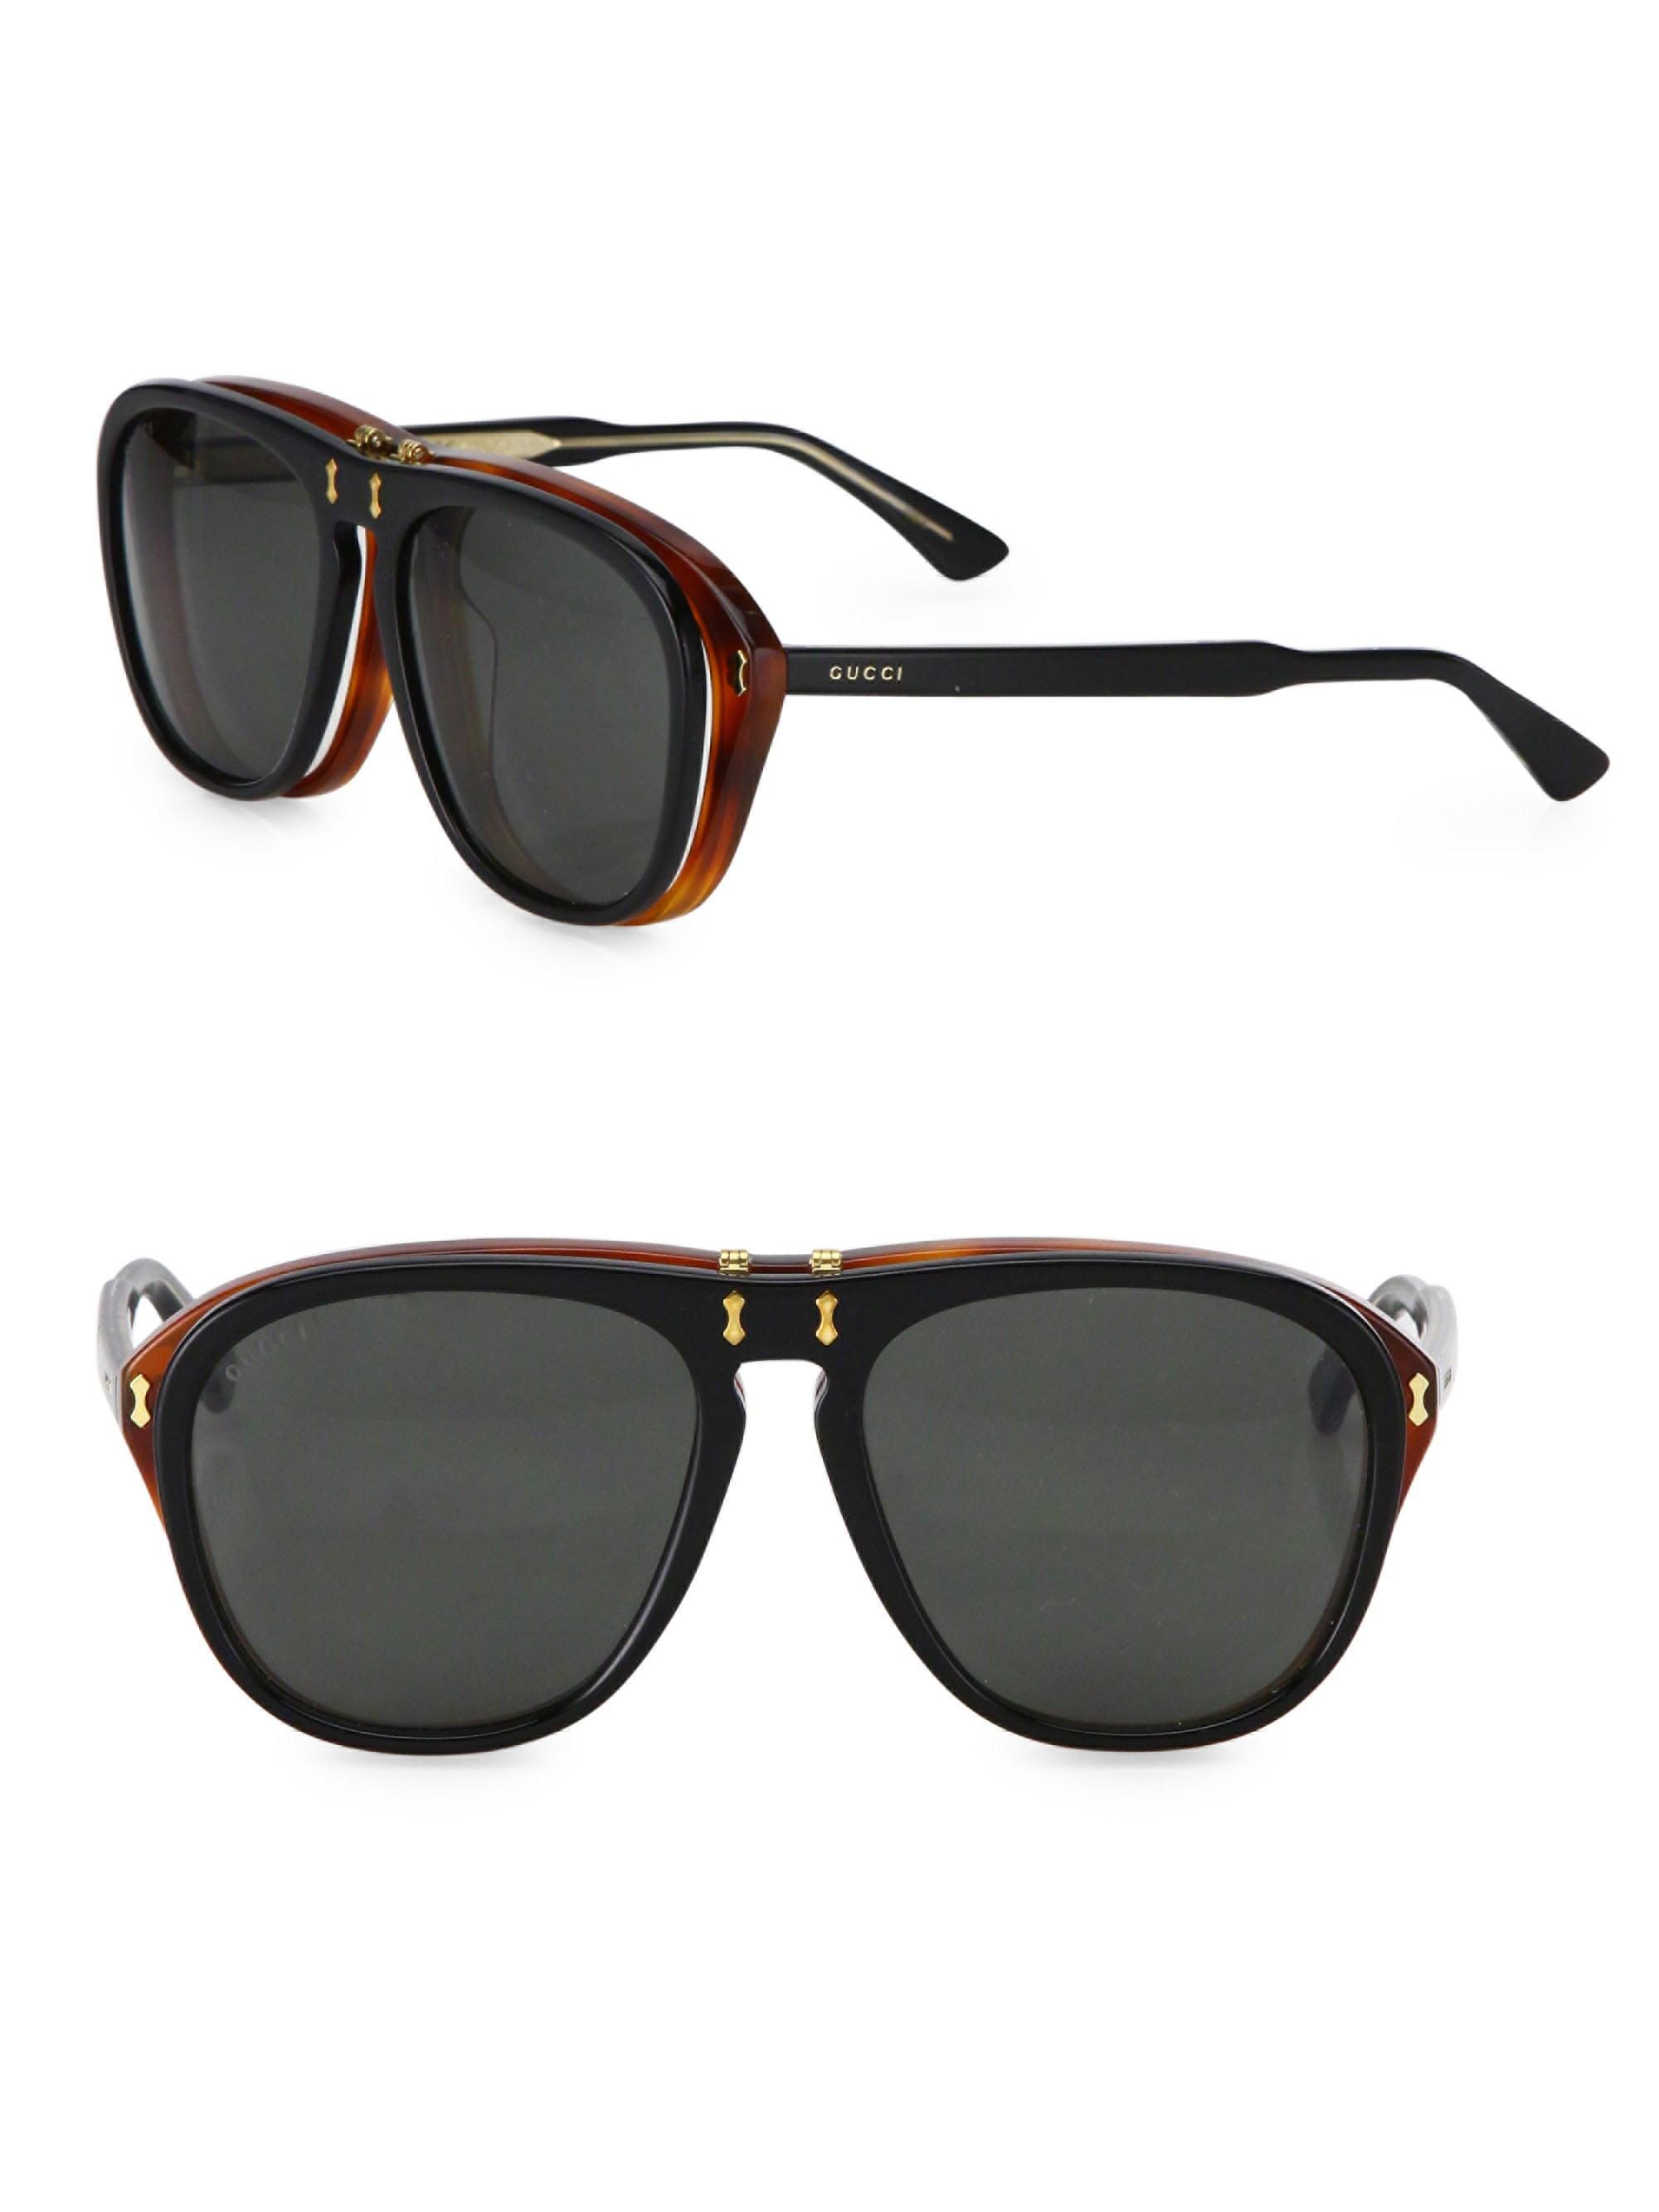 2aaebd8d7 Gucci Men's 56mm Flip-up Pilot Sunglasses - Black in Black for Men ...